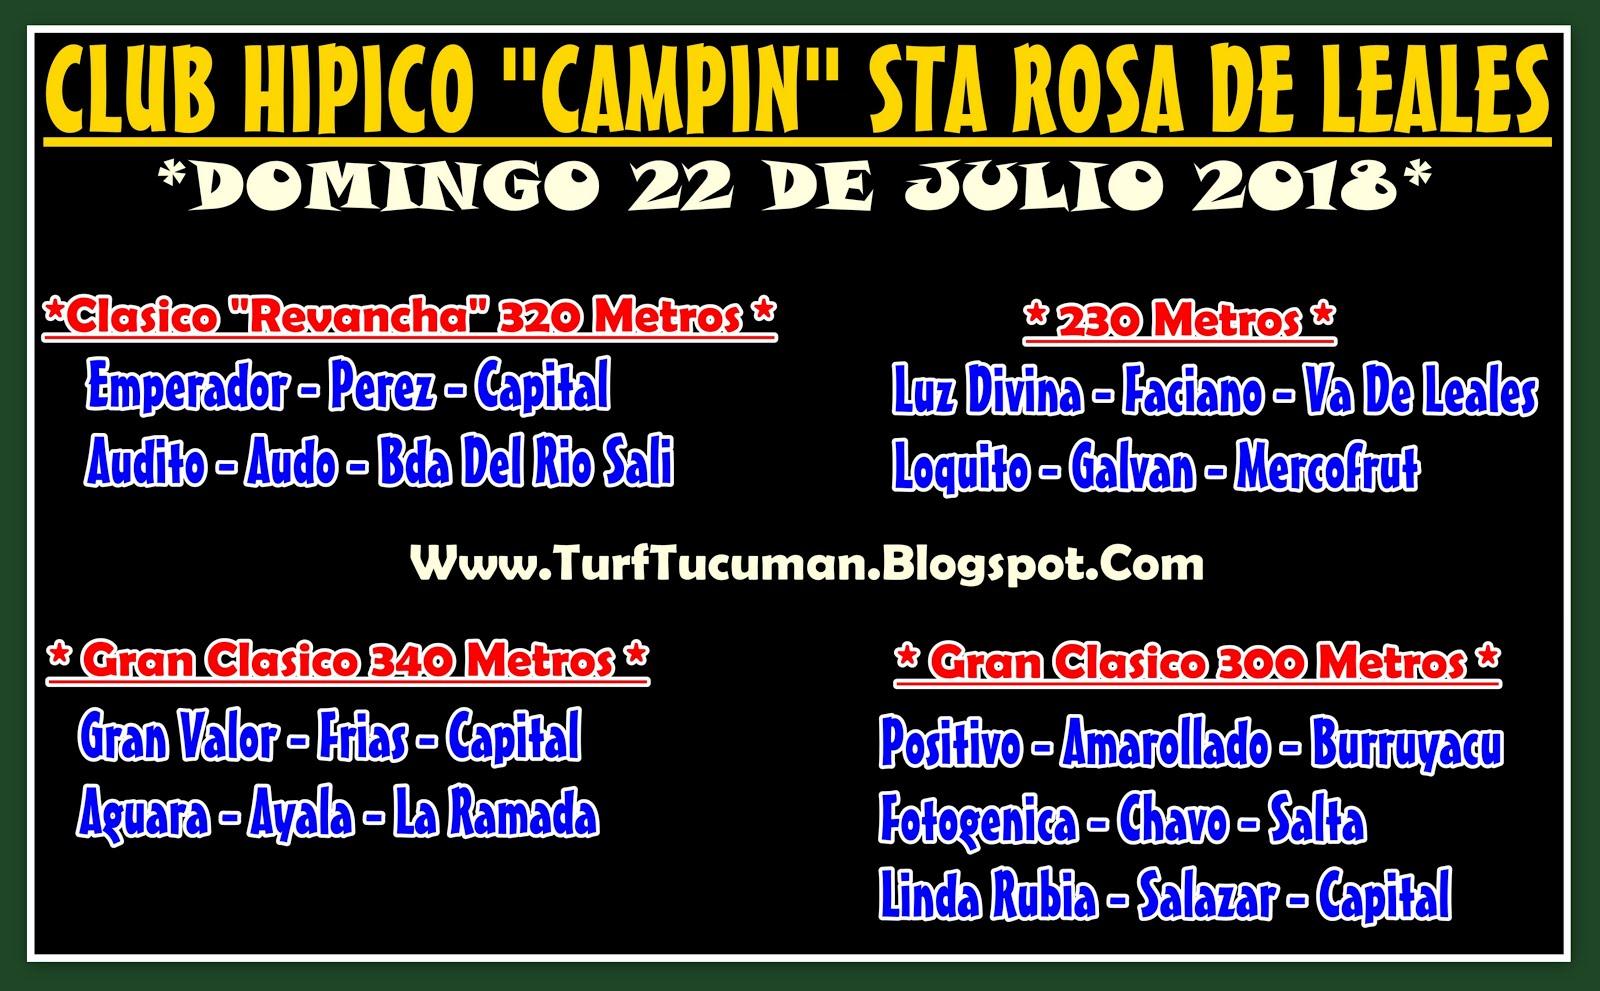 PROG CAMPIN DGO 22